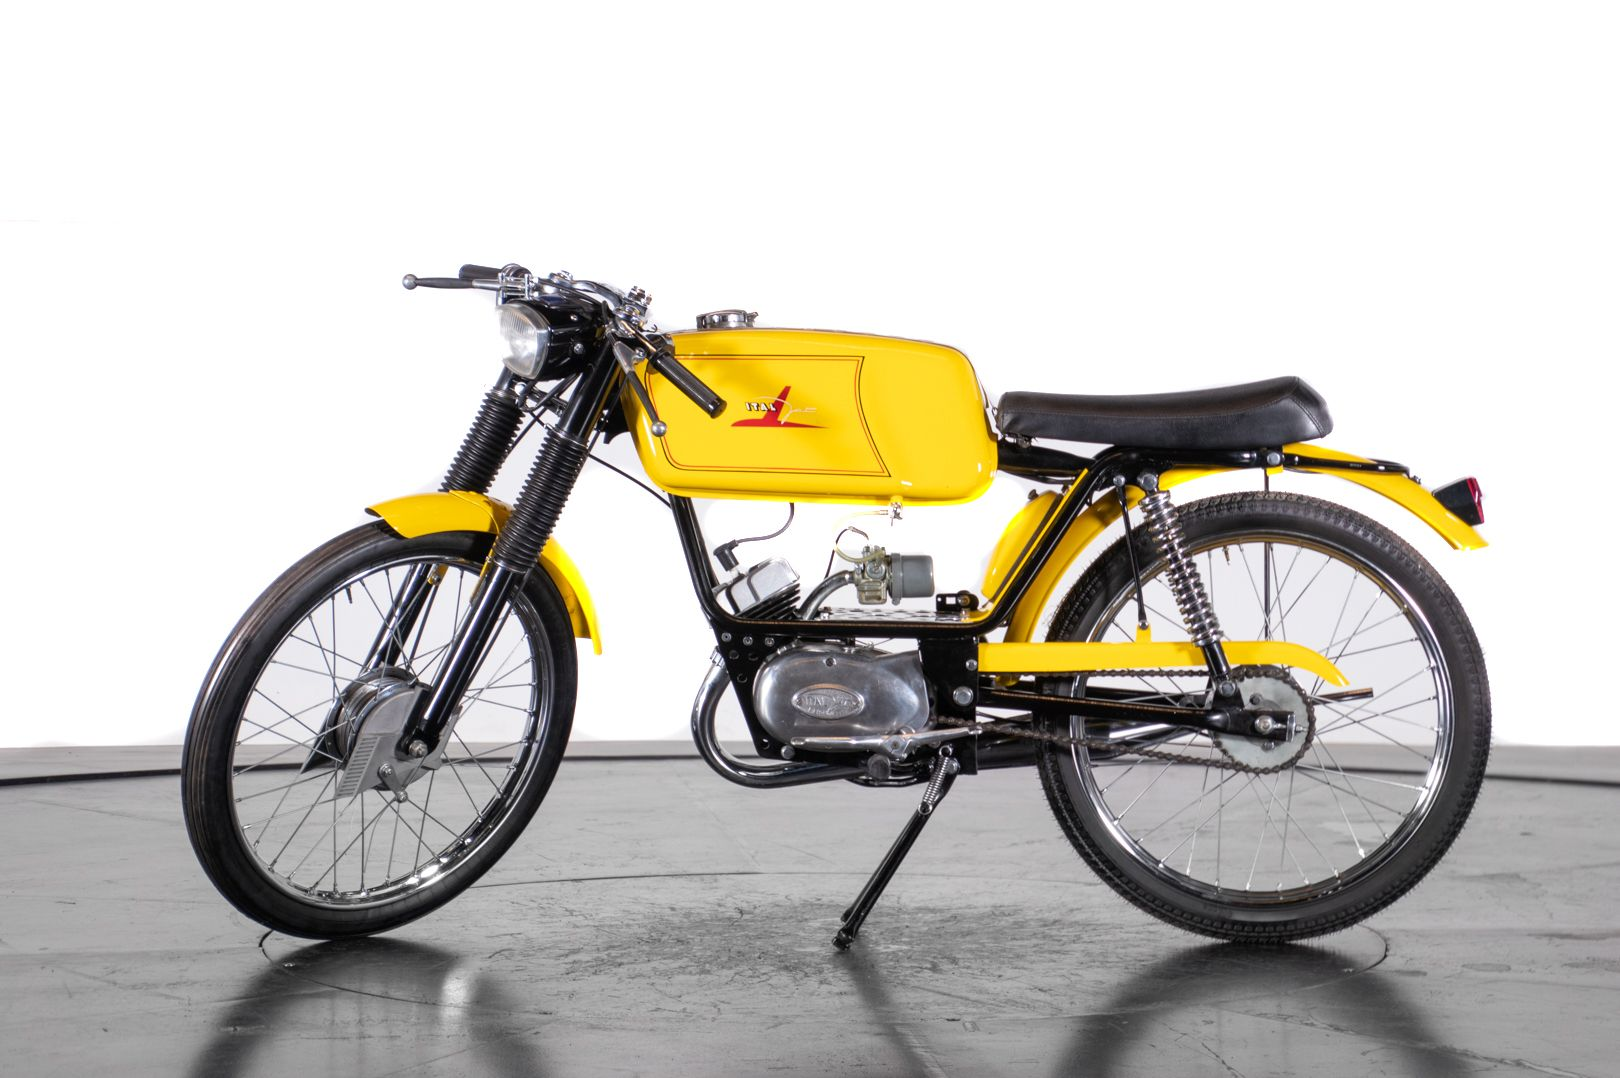 1969 ITALJET 50 CC 52185